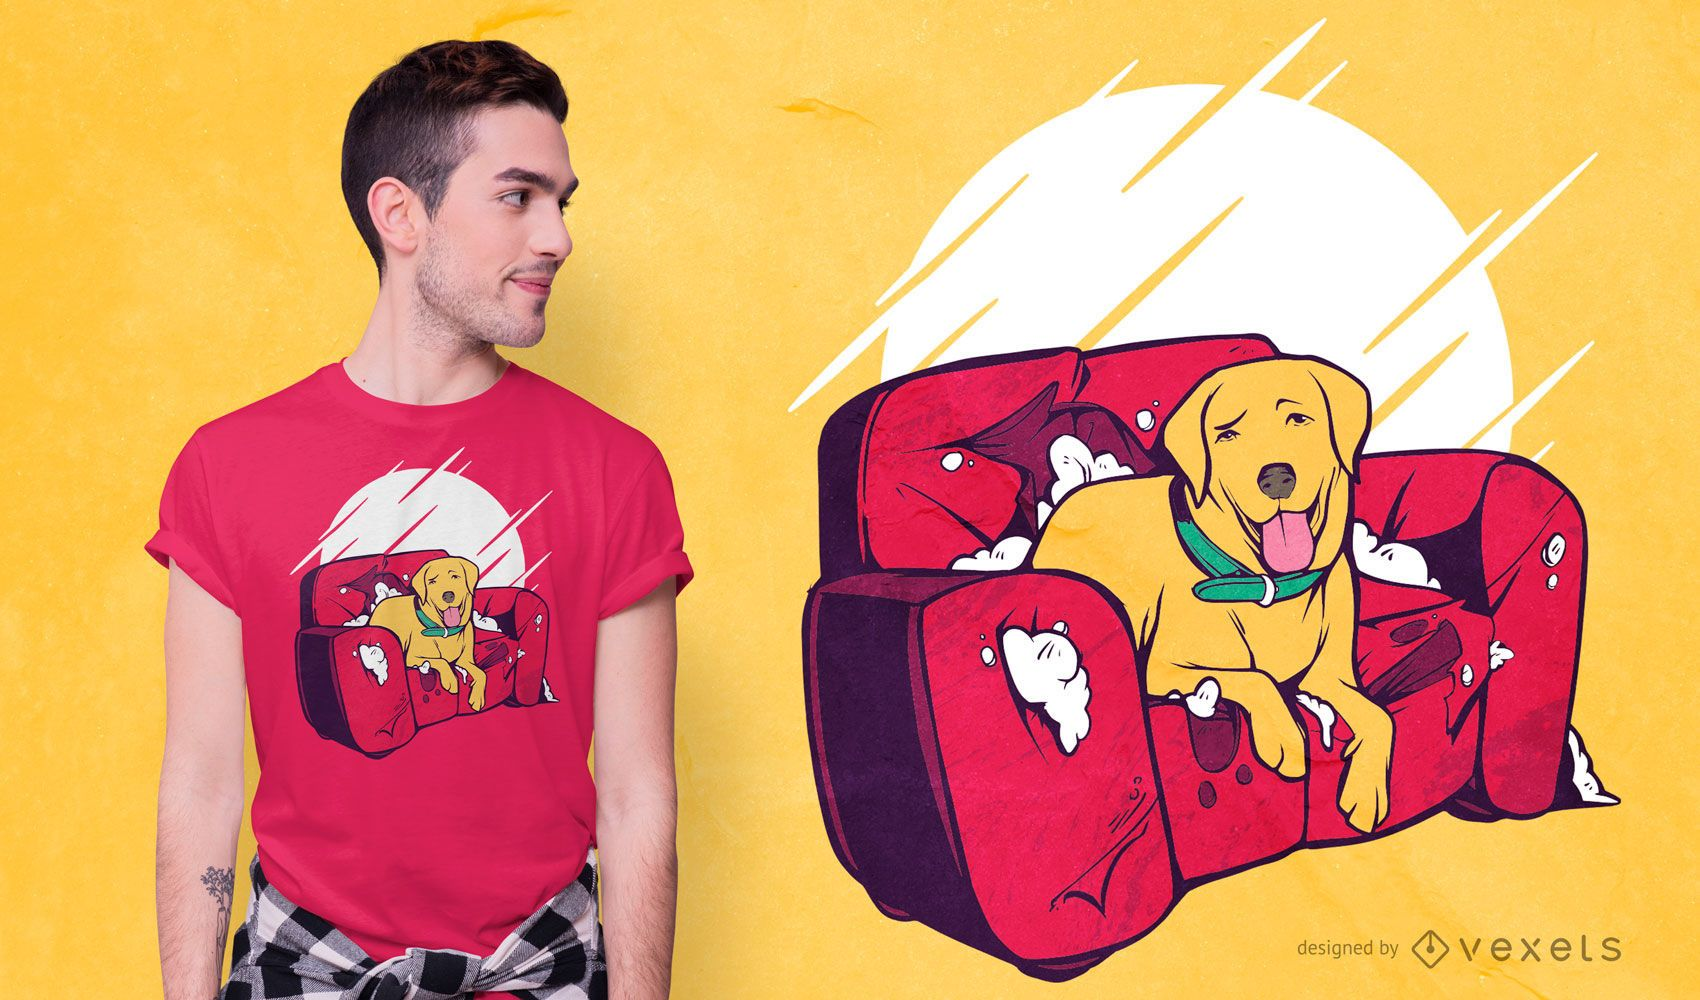 Bad dog funny t-shirt design